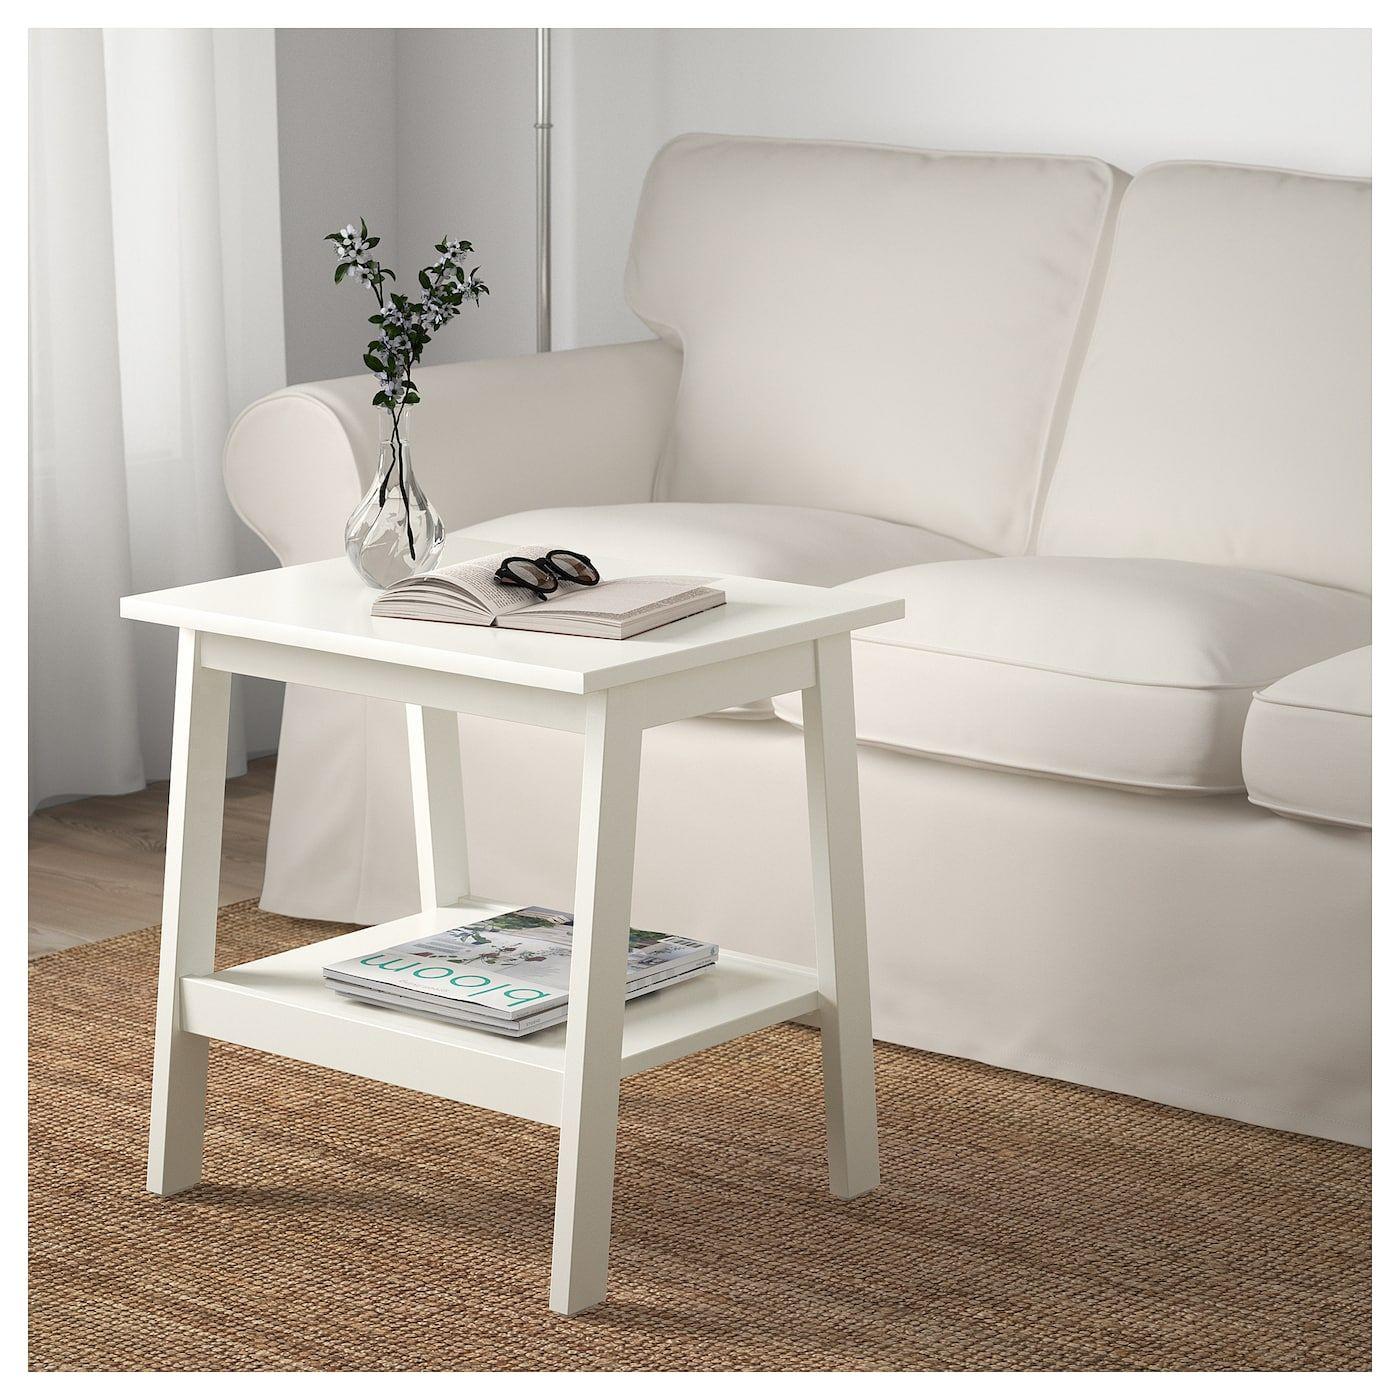 Lunnarp Side Table White 21 5 8x17 3 4 Ikea Mesa Auxiliar Ikea Interiores De Casas Pequenas Mesa Auxiliar [ 1400 x 1400 Pixel ]